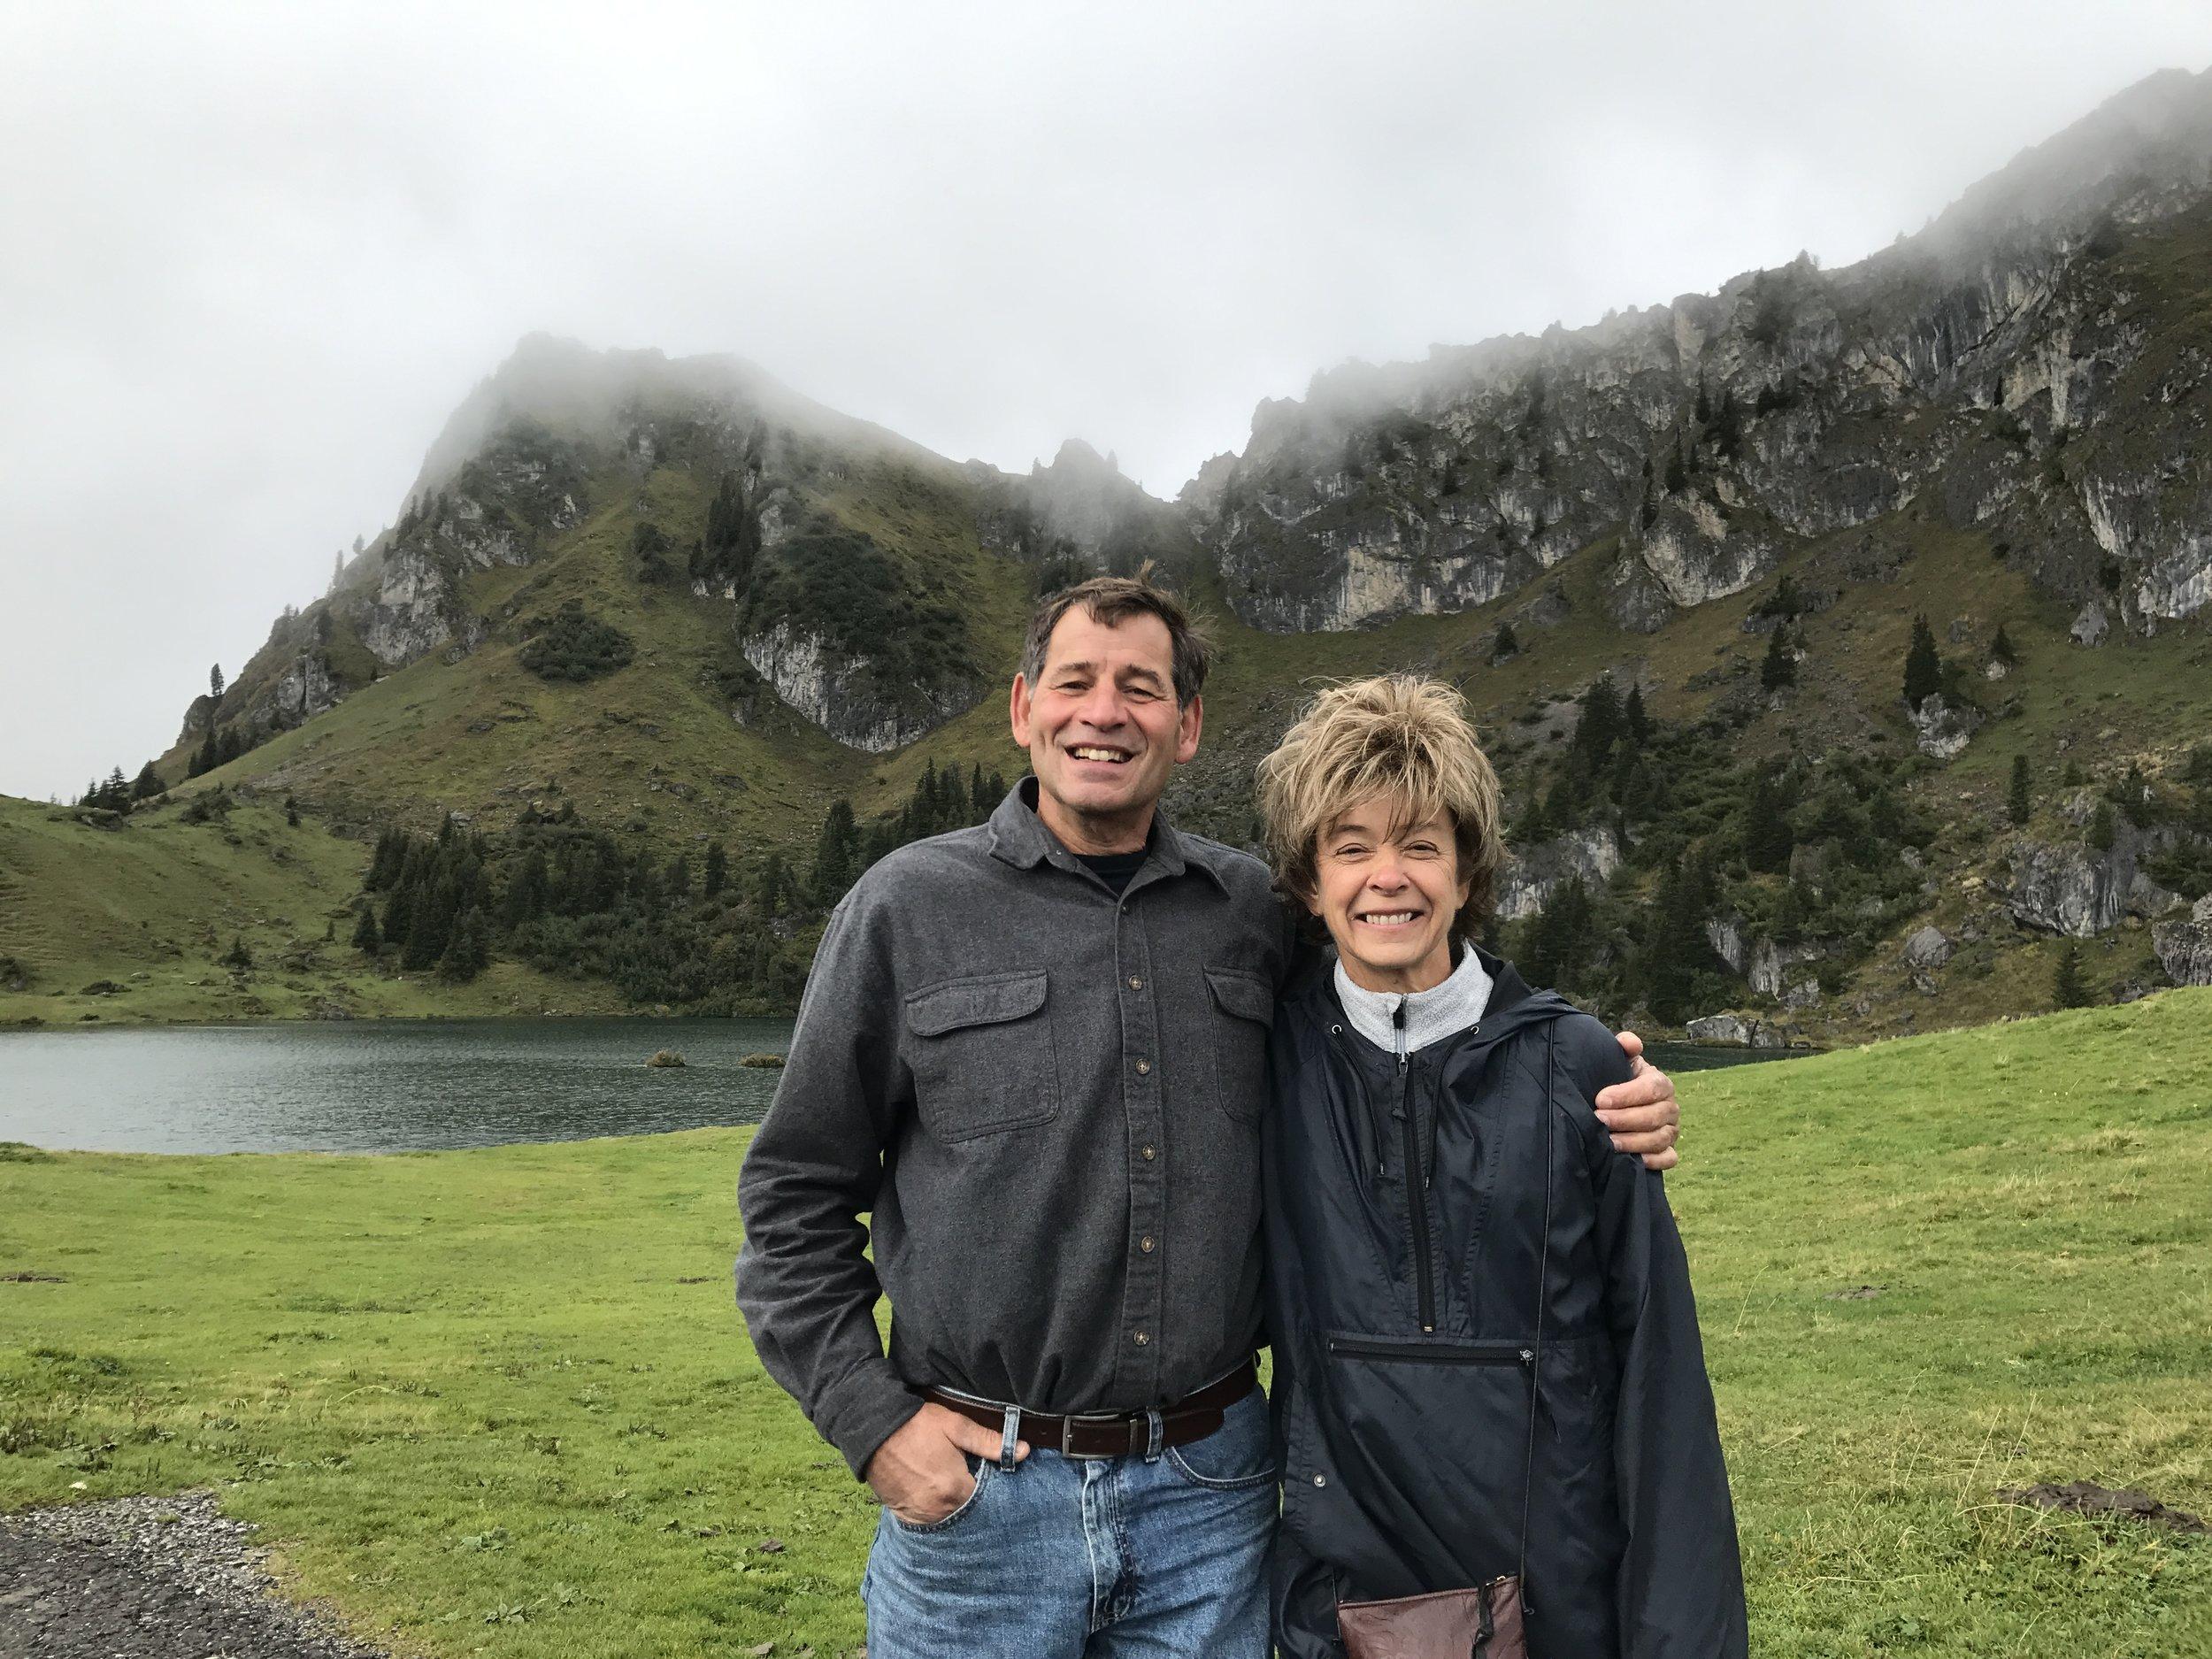 - September 2017: Jeff and Ann, at Seeberg See. From Interlaken to Gruyères to Alt Kombett:good times